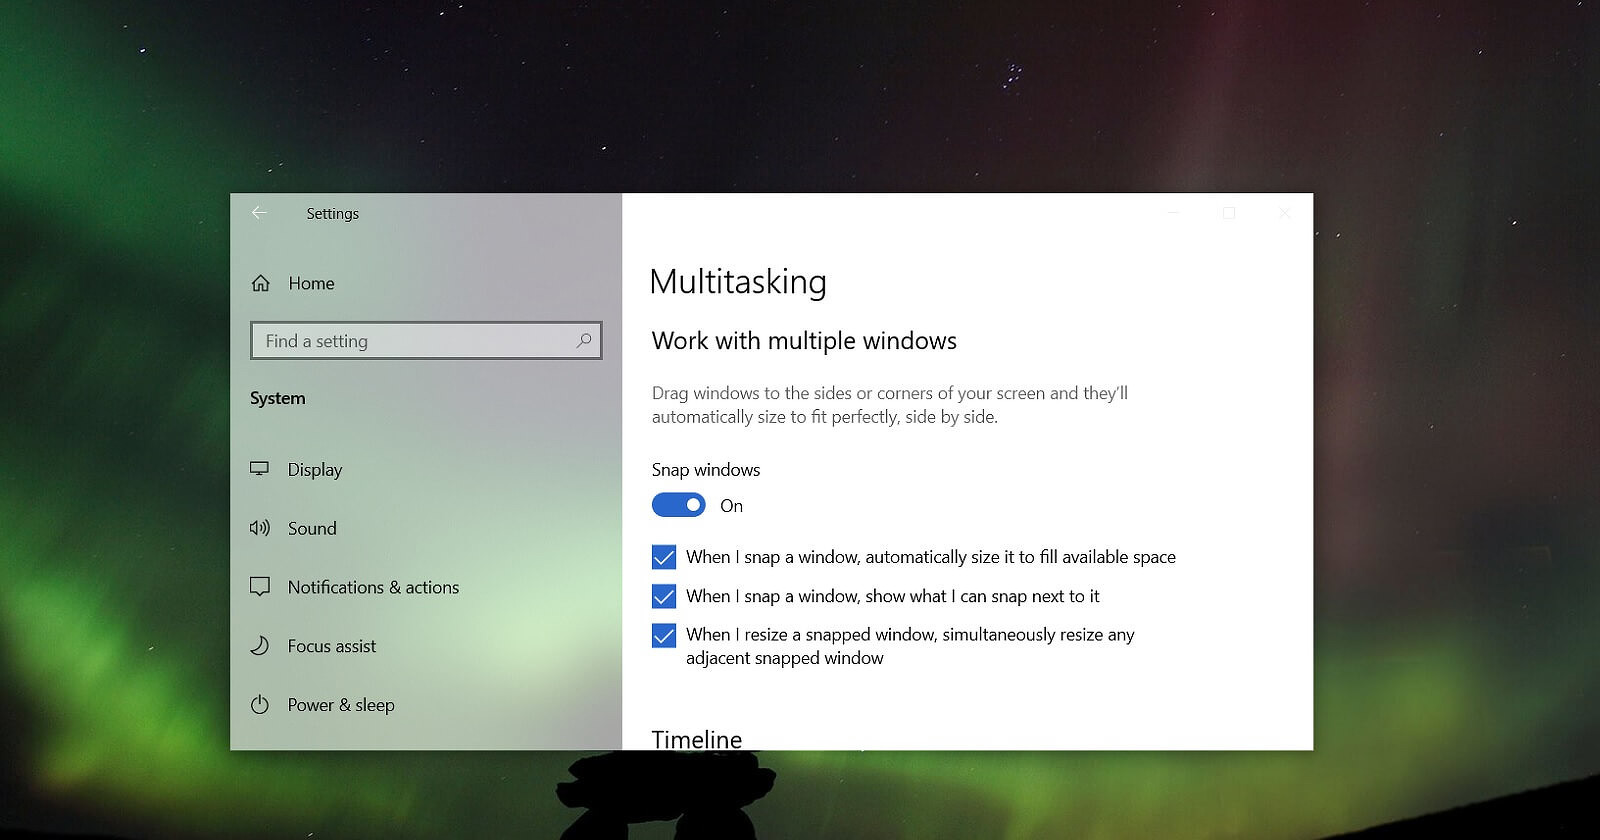 windows10multitaskingfeature.jpg